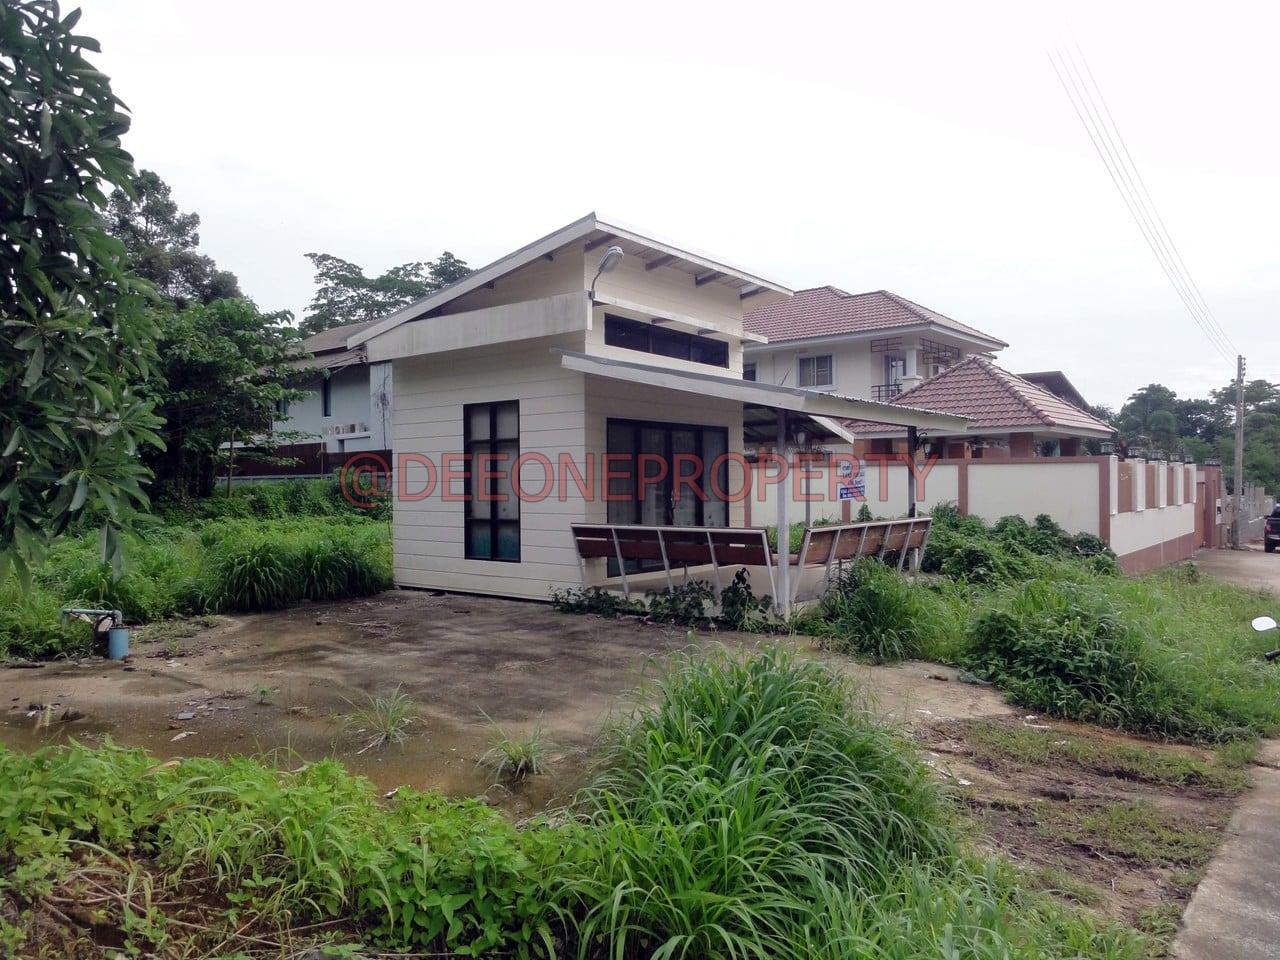 House Plot for Sale – Chaiya Chet, Koh Chang